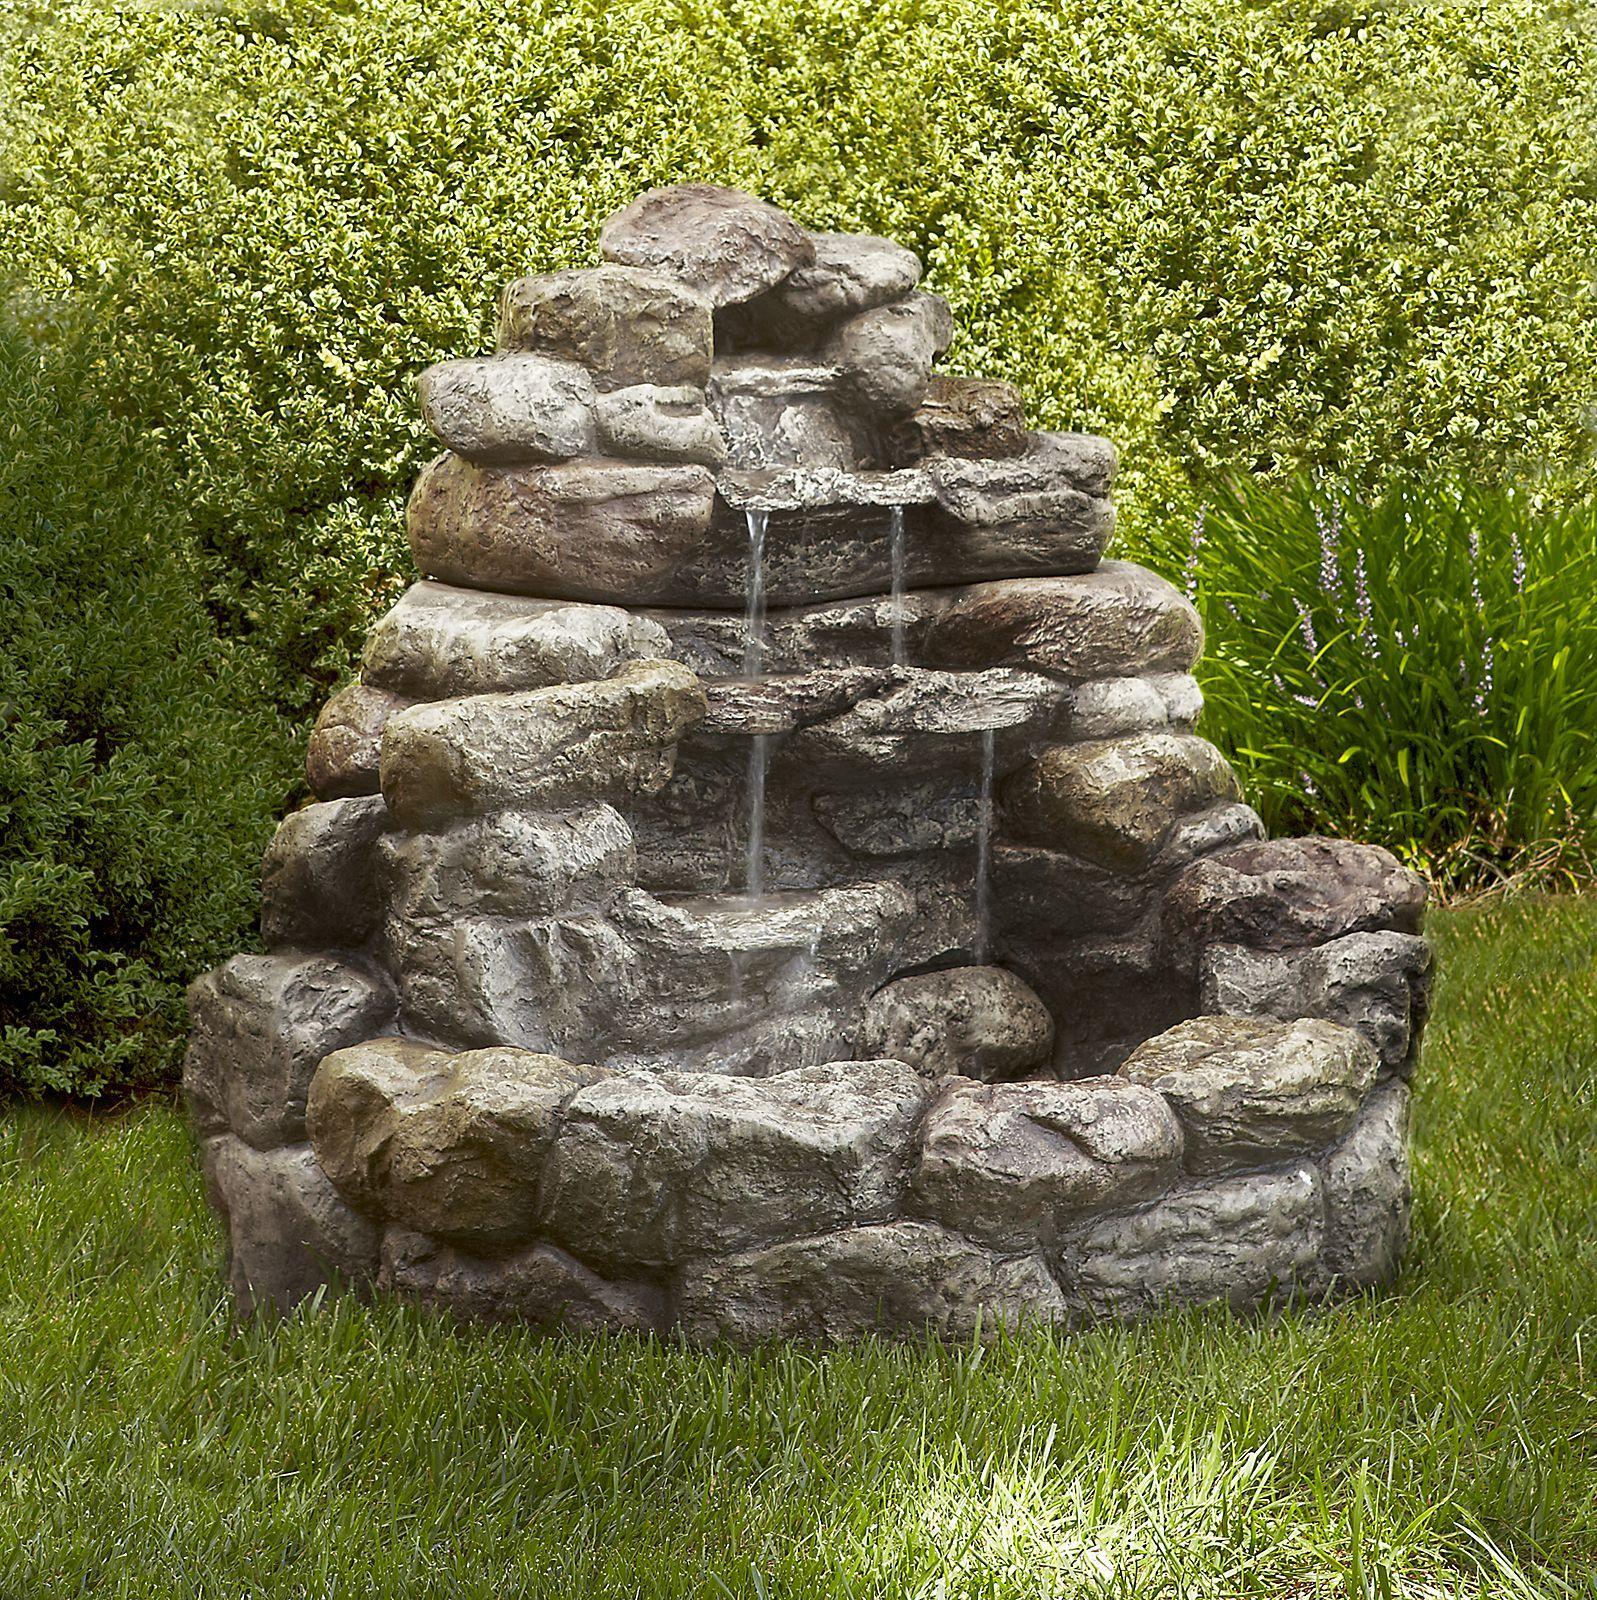 Tiered Stone Water Fountain For Minimalist Outdoor Garden Design ...